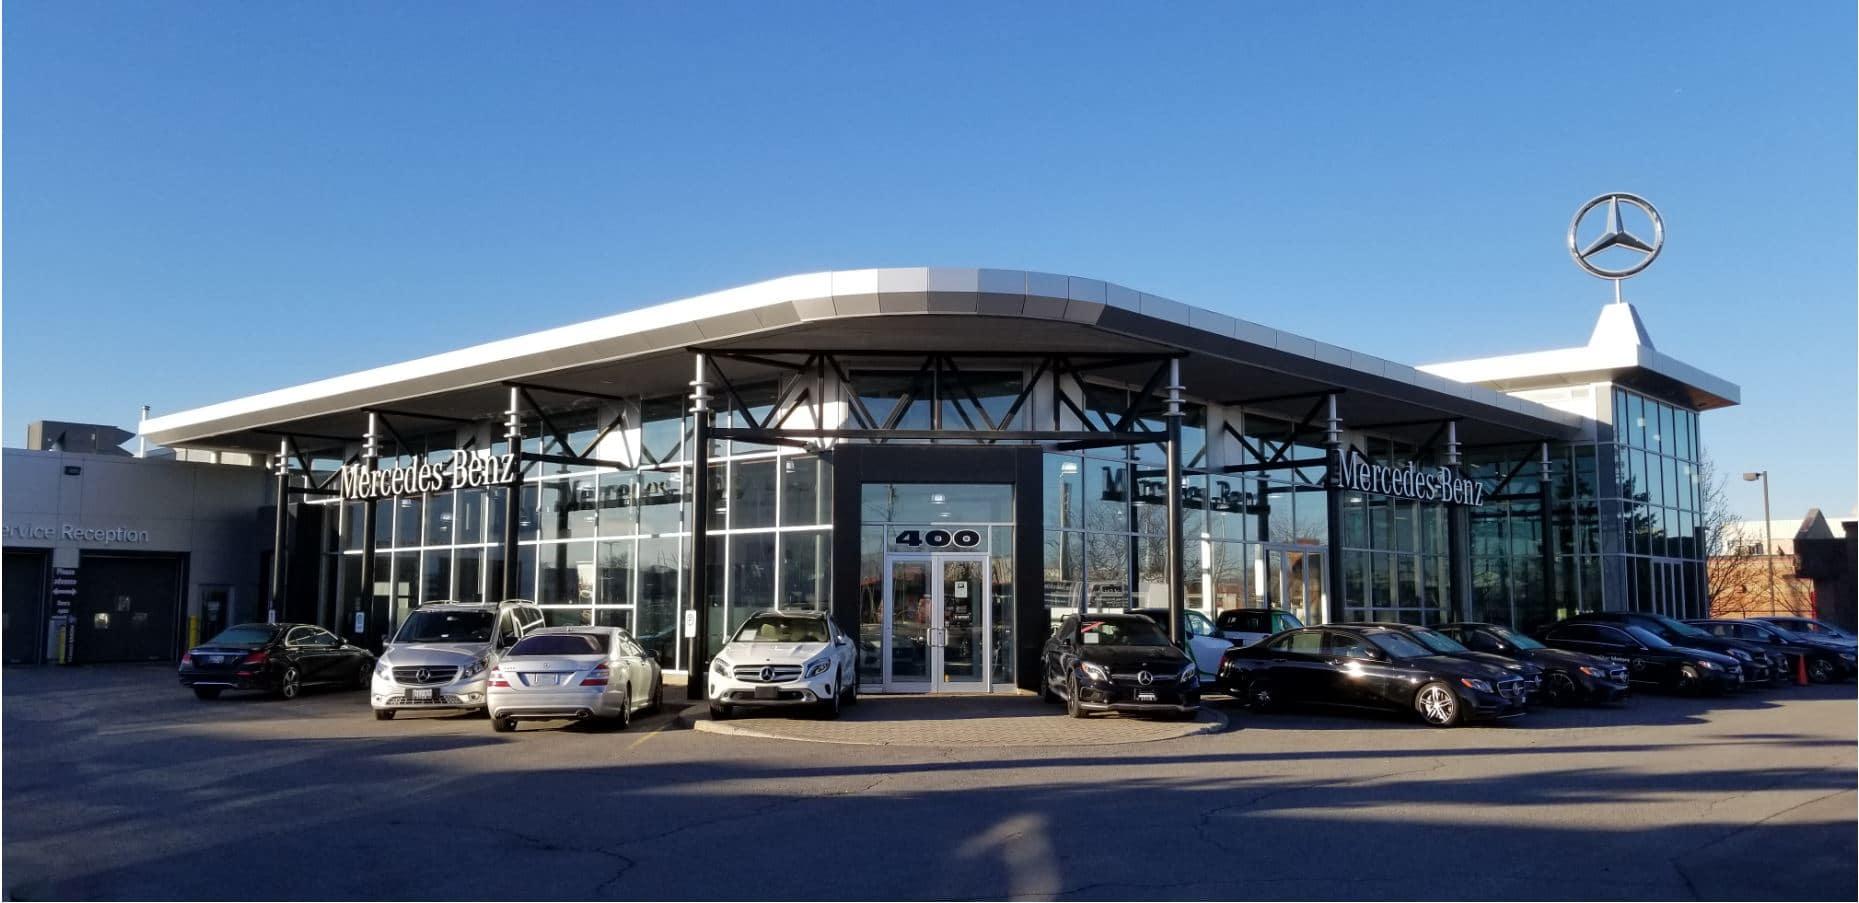 Mercedes Benz Dealership >> Welcome Star Motors Of Ottawa Mercedes Benz